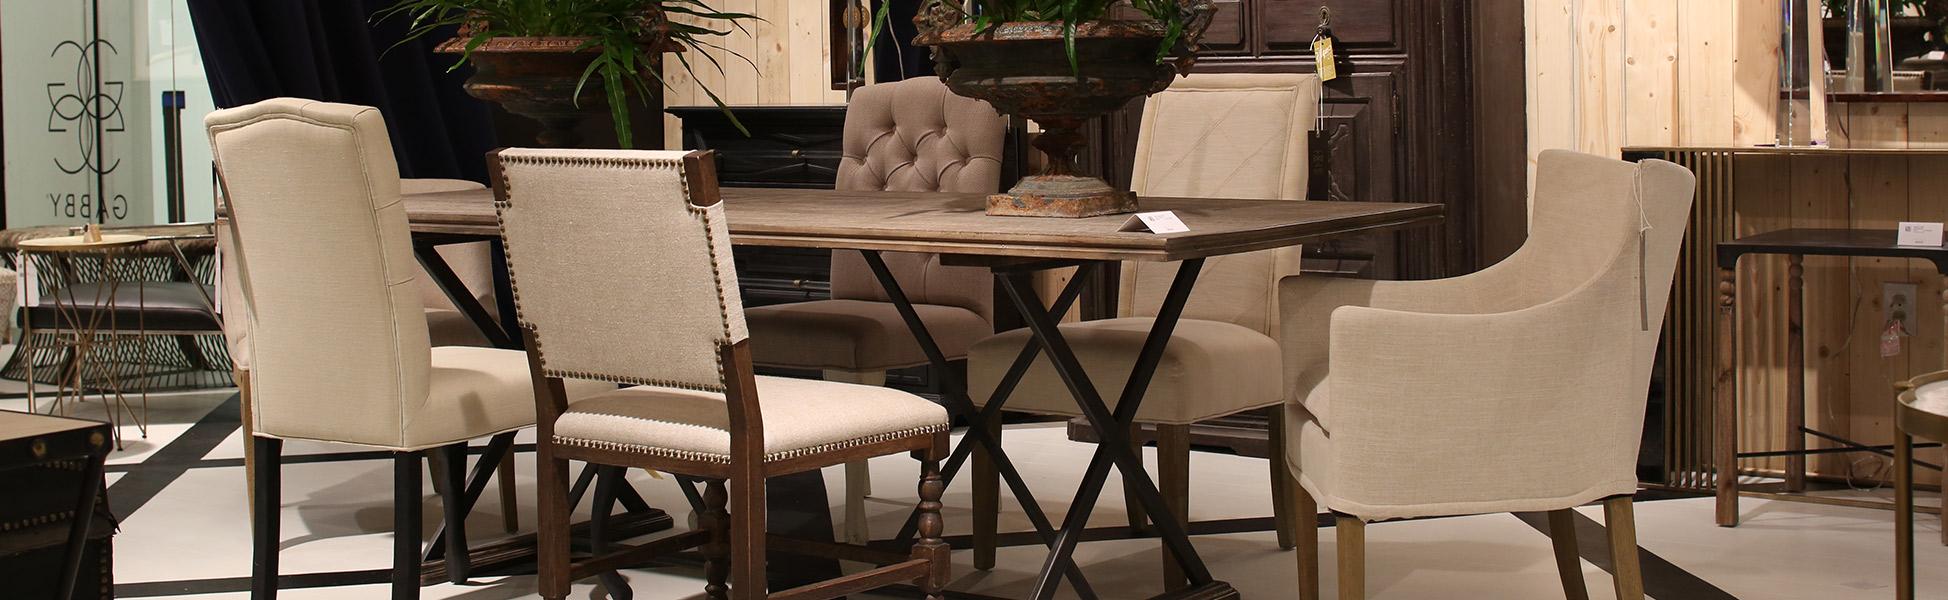 Home Furnishing Sales